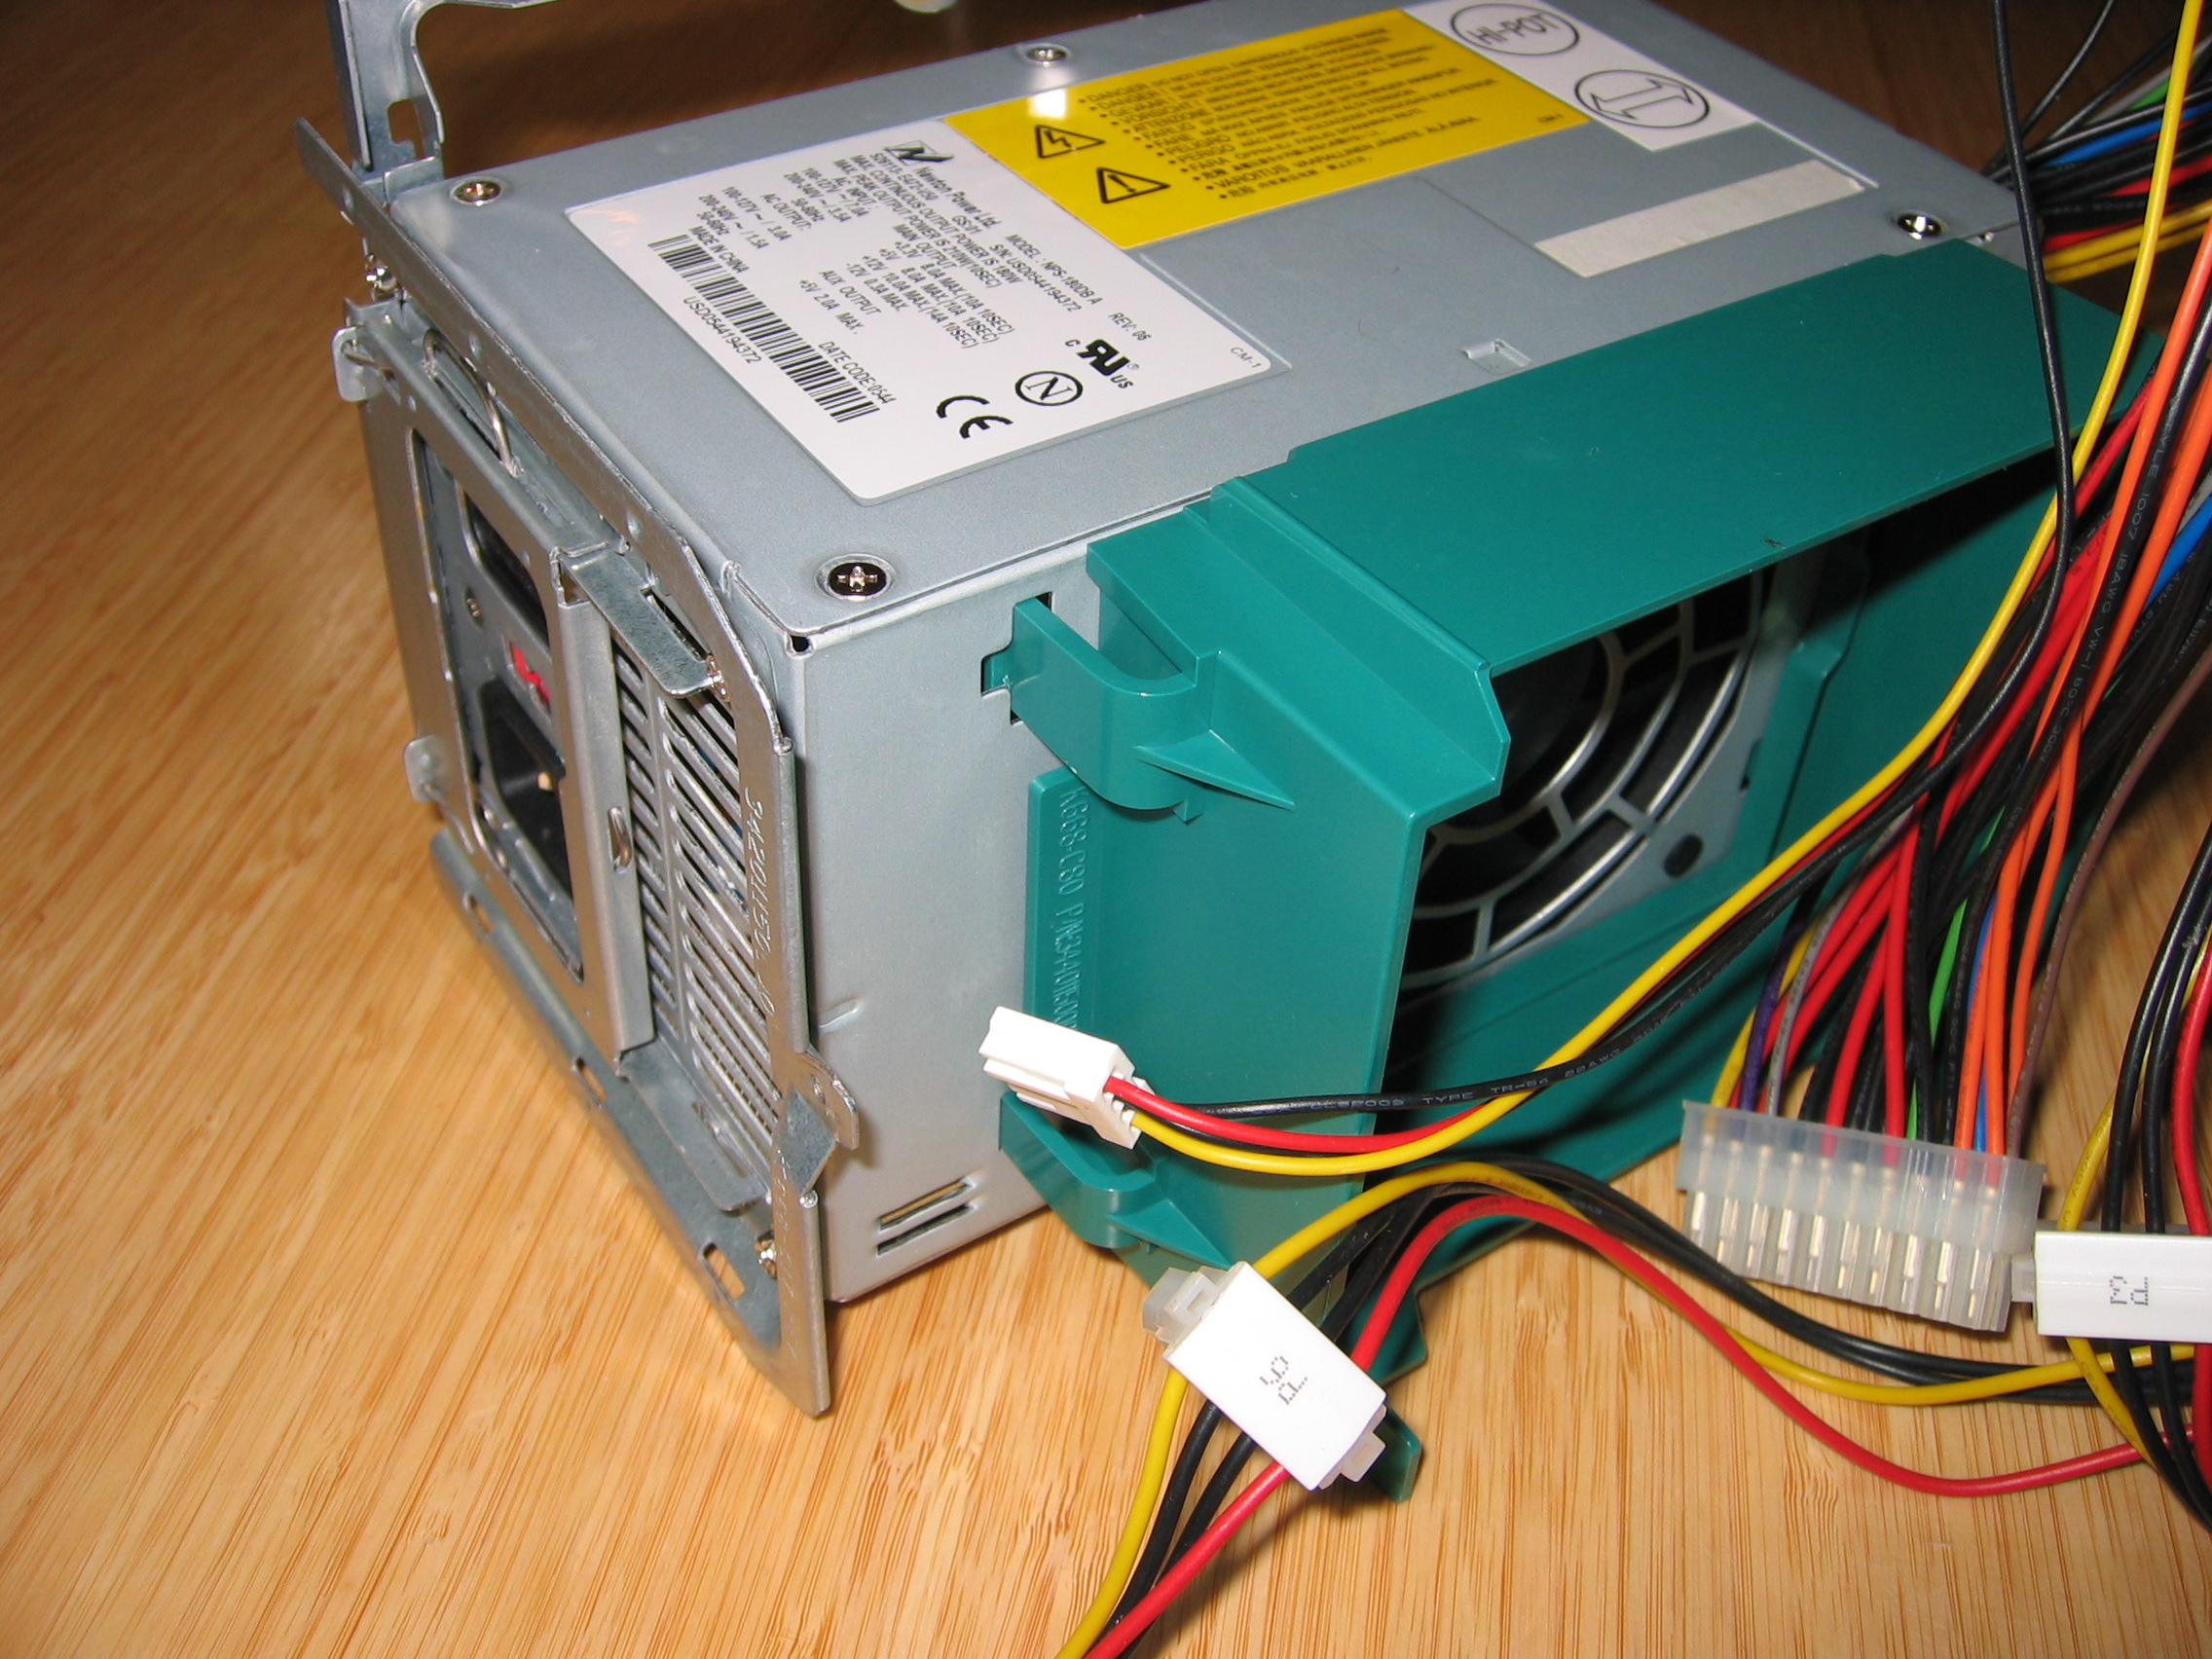 Cpu Power Unit File:pc Power Supply Unit Psu